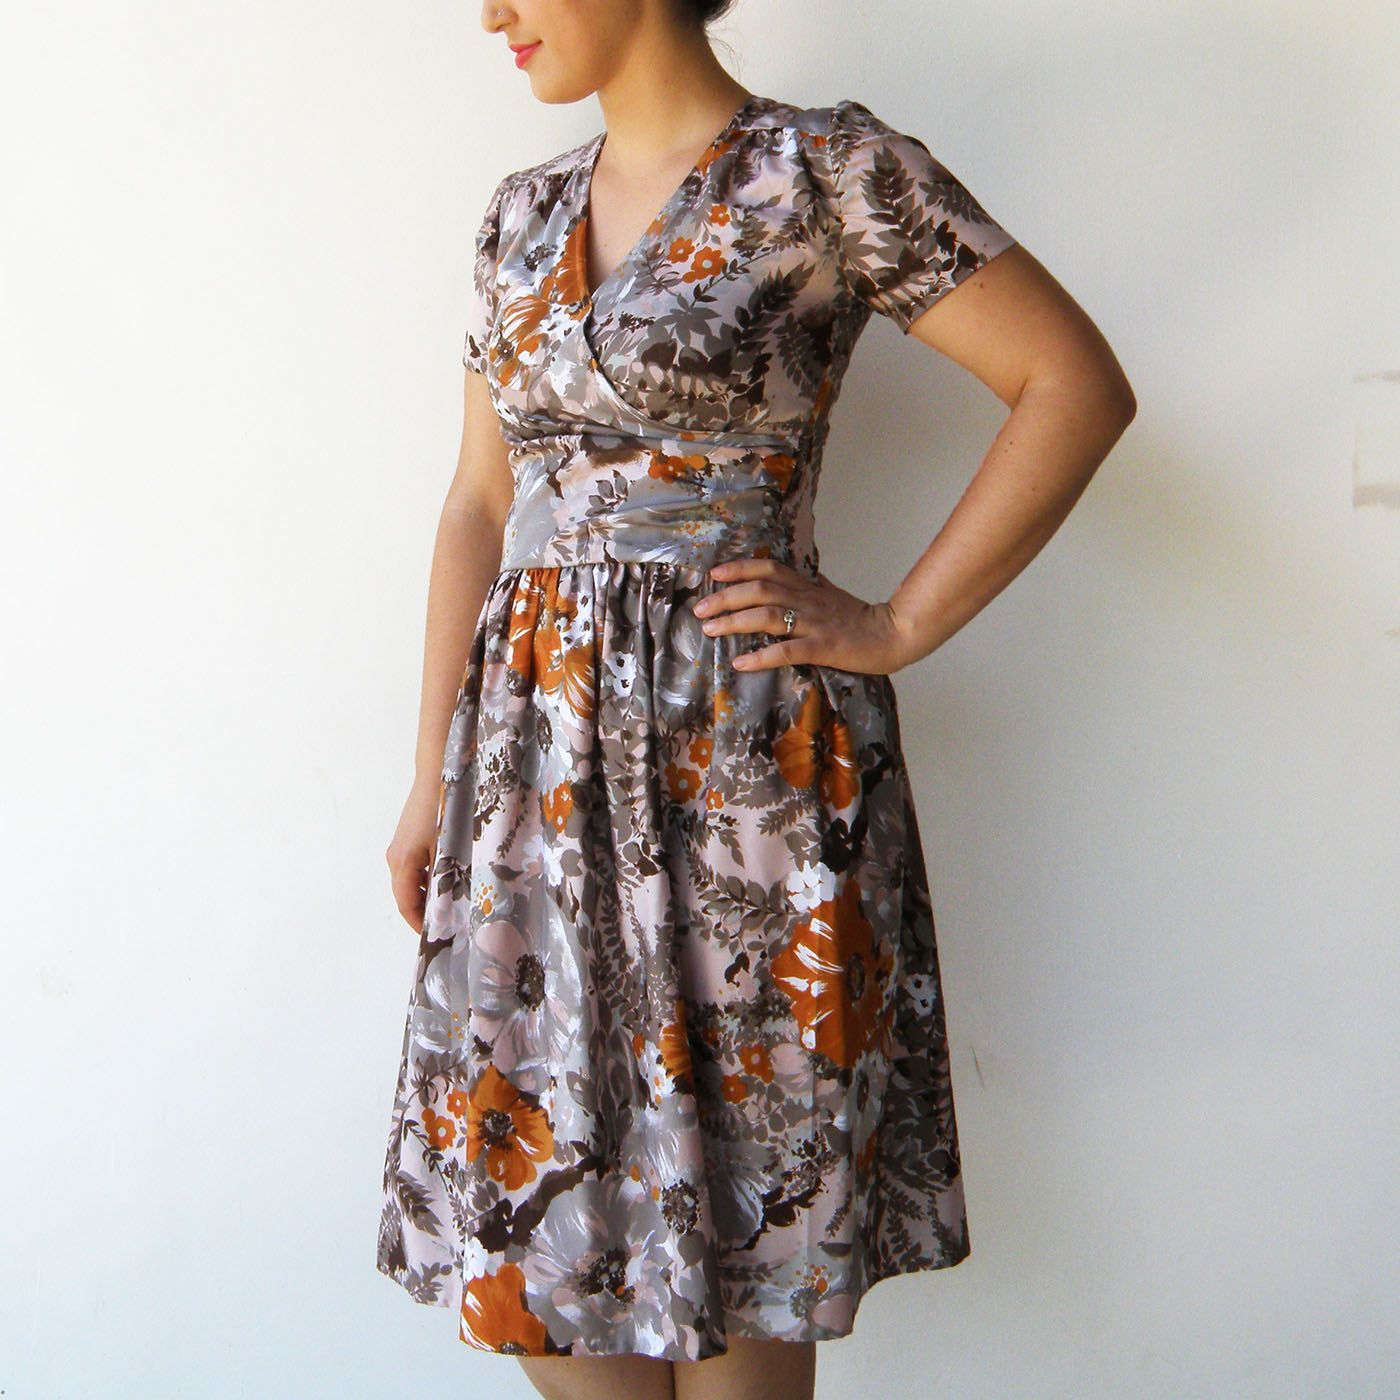 Vintage Fall Flowers Dress / 1950s Dress / Size M L by rakshniyavintage on Etsy